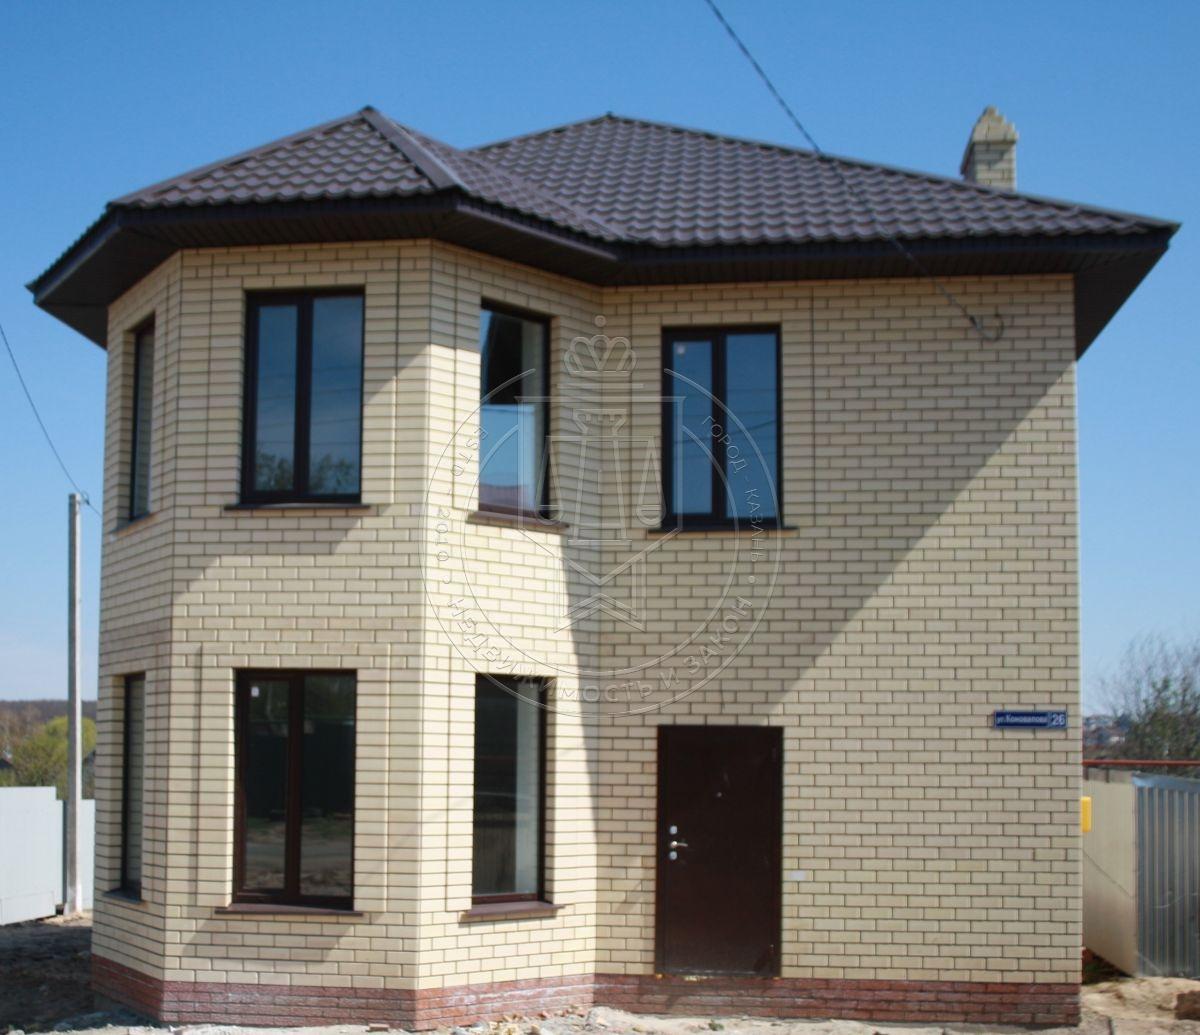 Продажа  дома коновалова, 170 м²  (миниатюра №1)